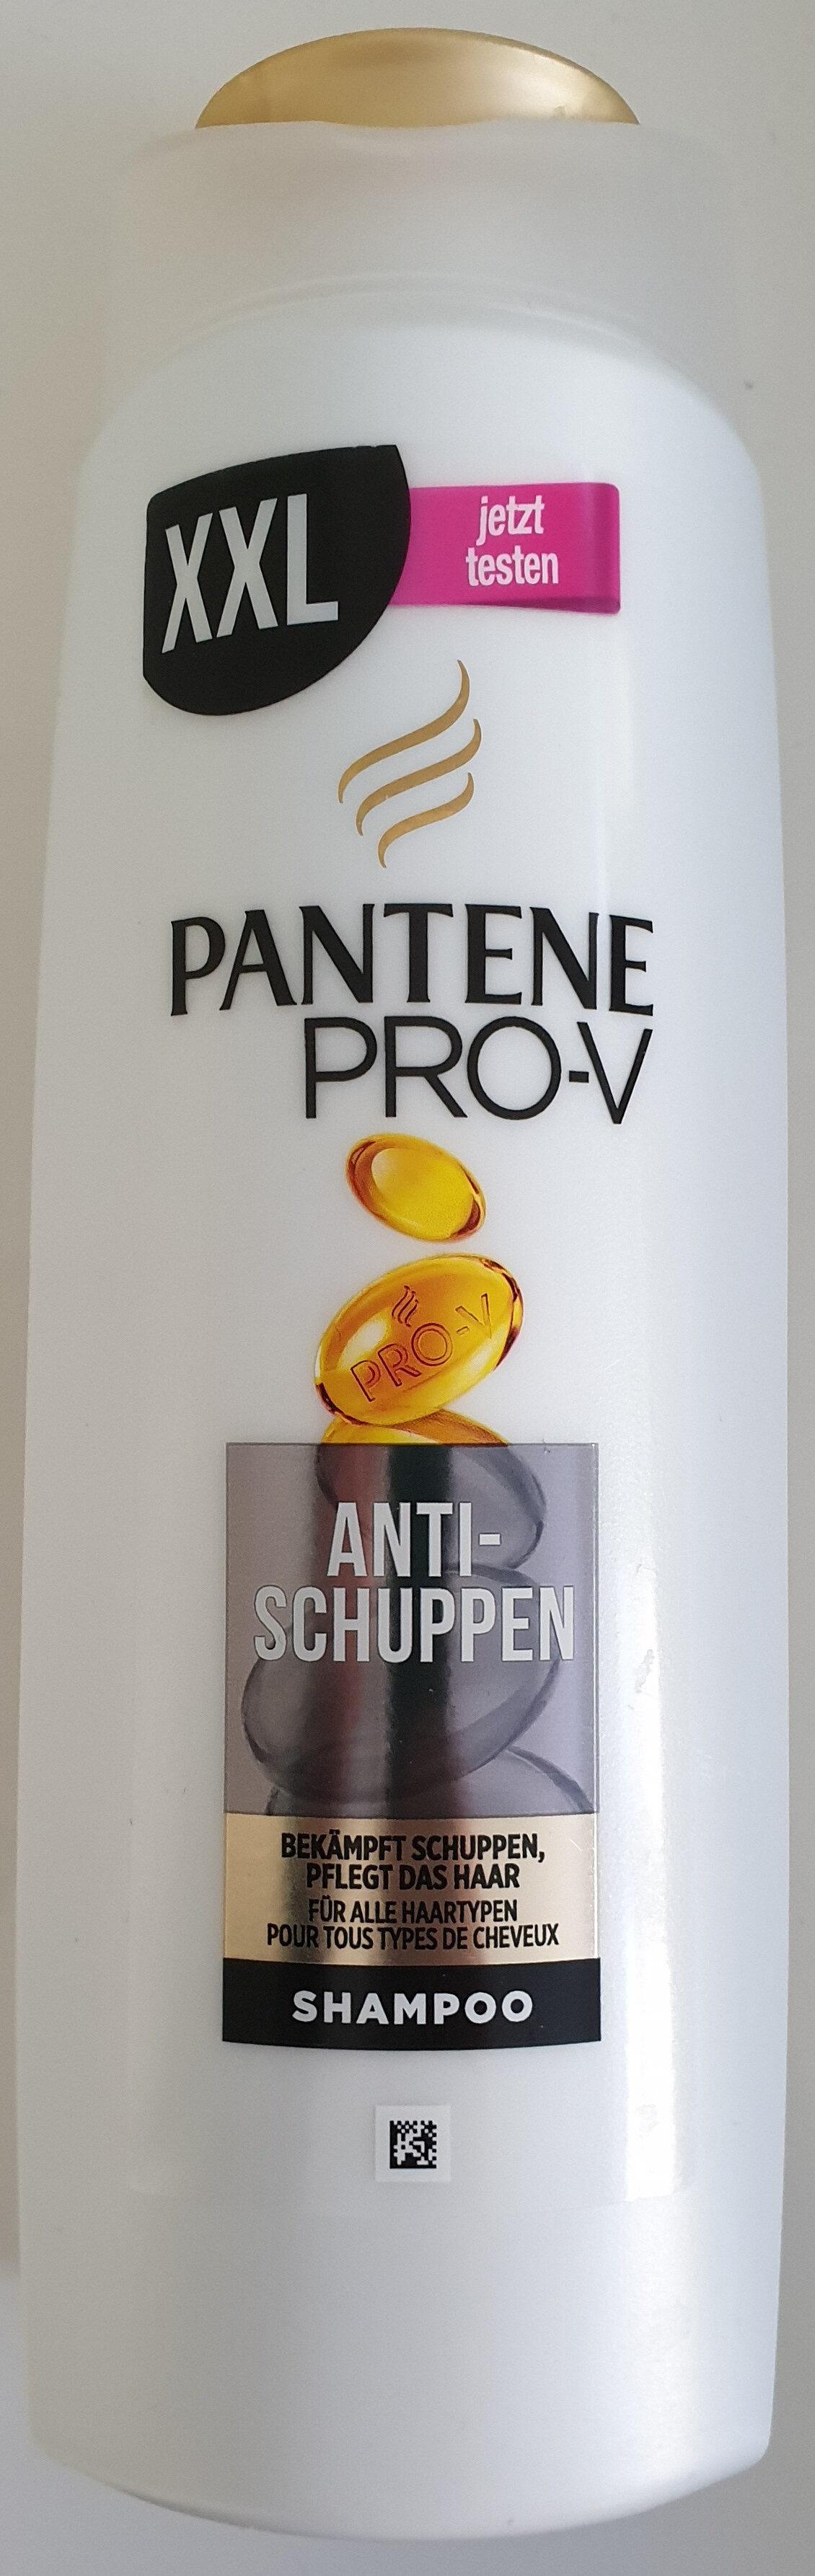 PRO-V Anti-Schuppen Shampoo - Product - de